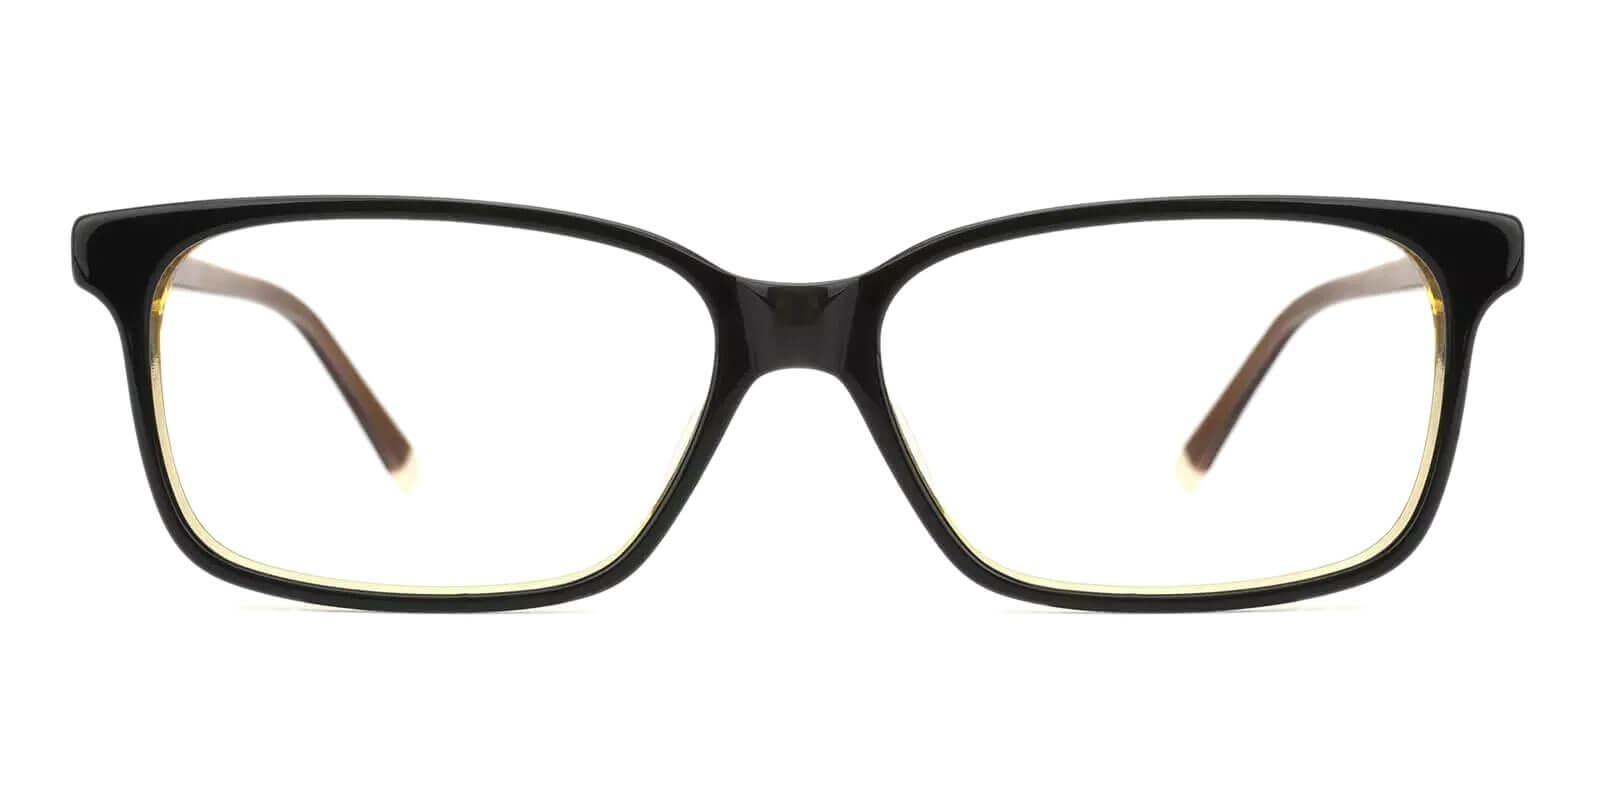 Lochloosa Brown Acetate Eyeglasses , SpringHinges , UniversalBridgeFit Frames from ABBE Glasses